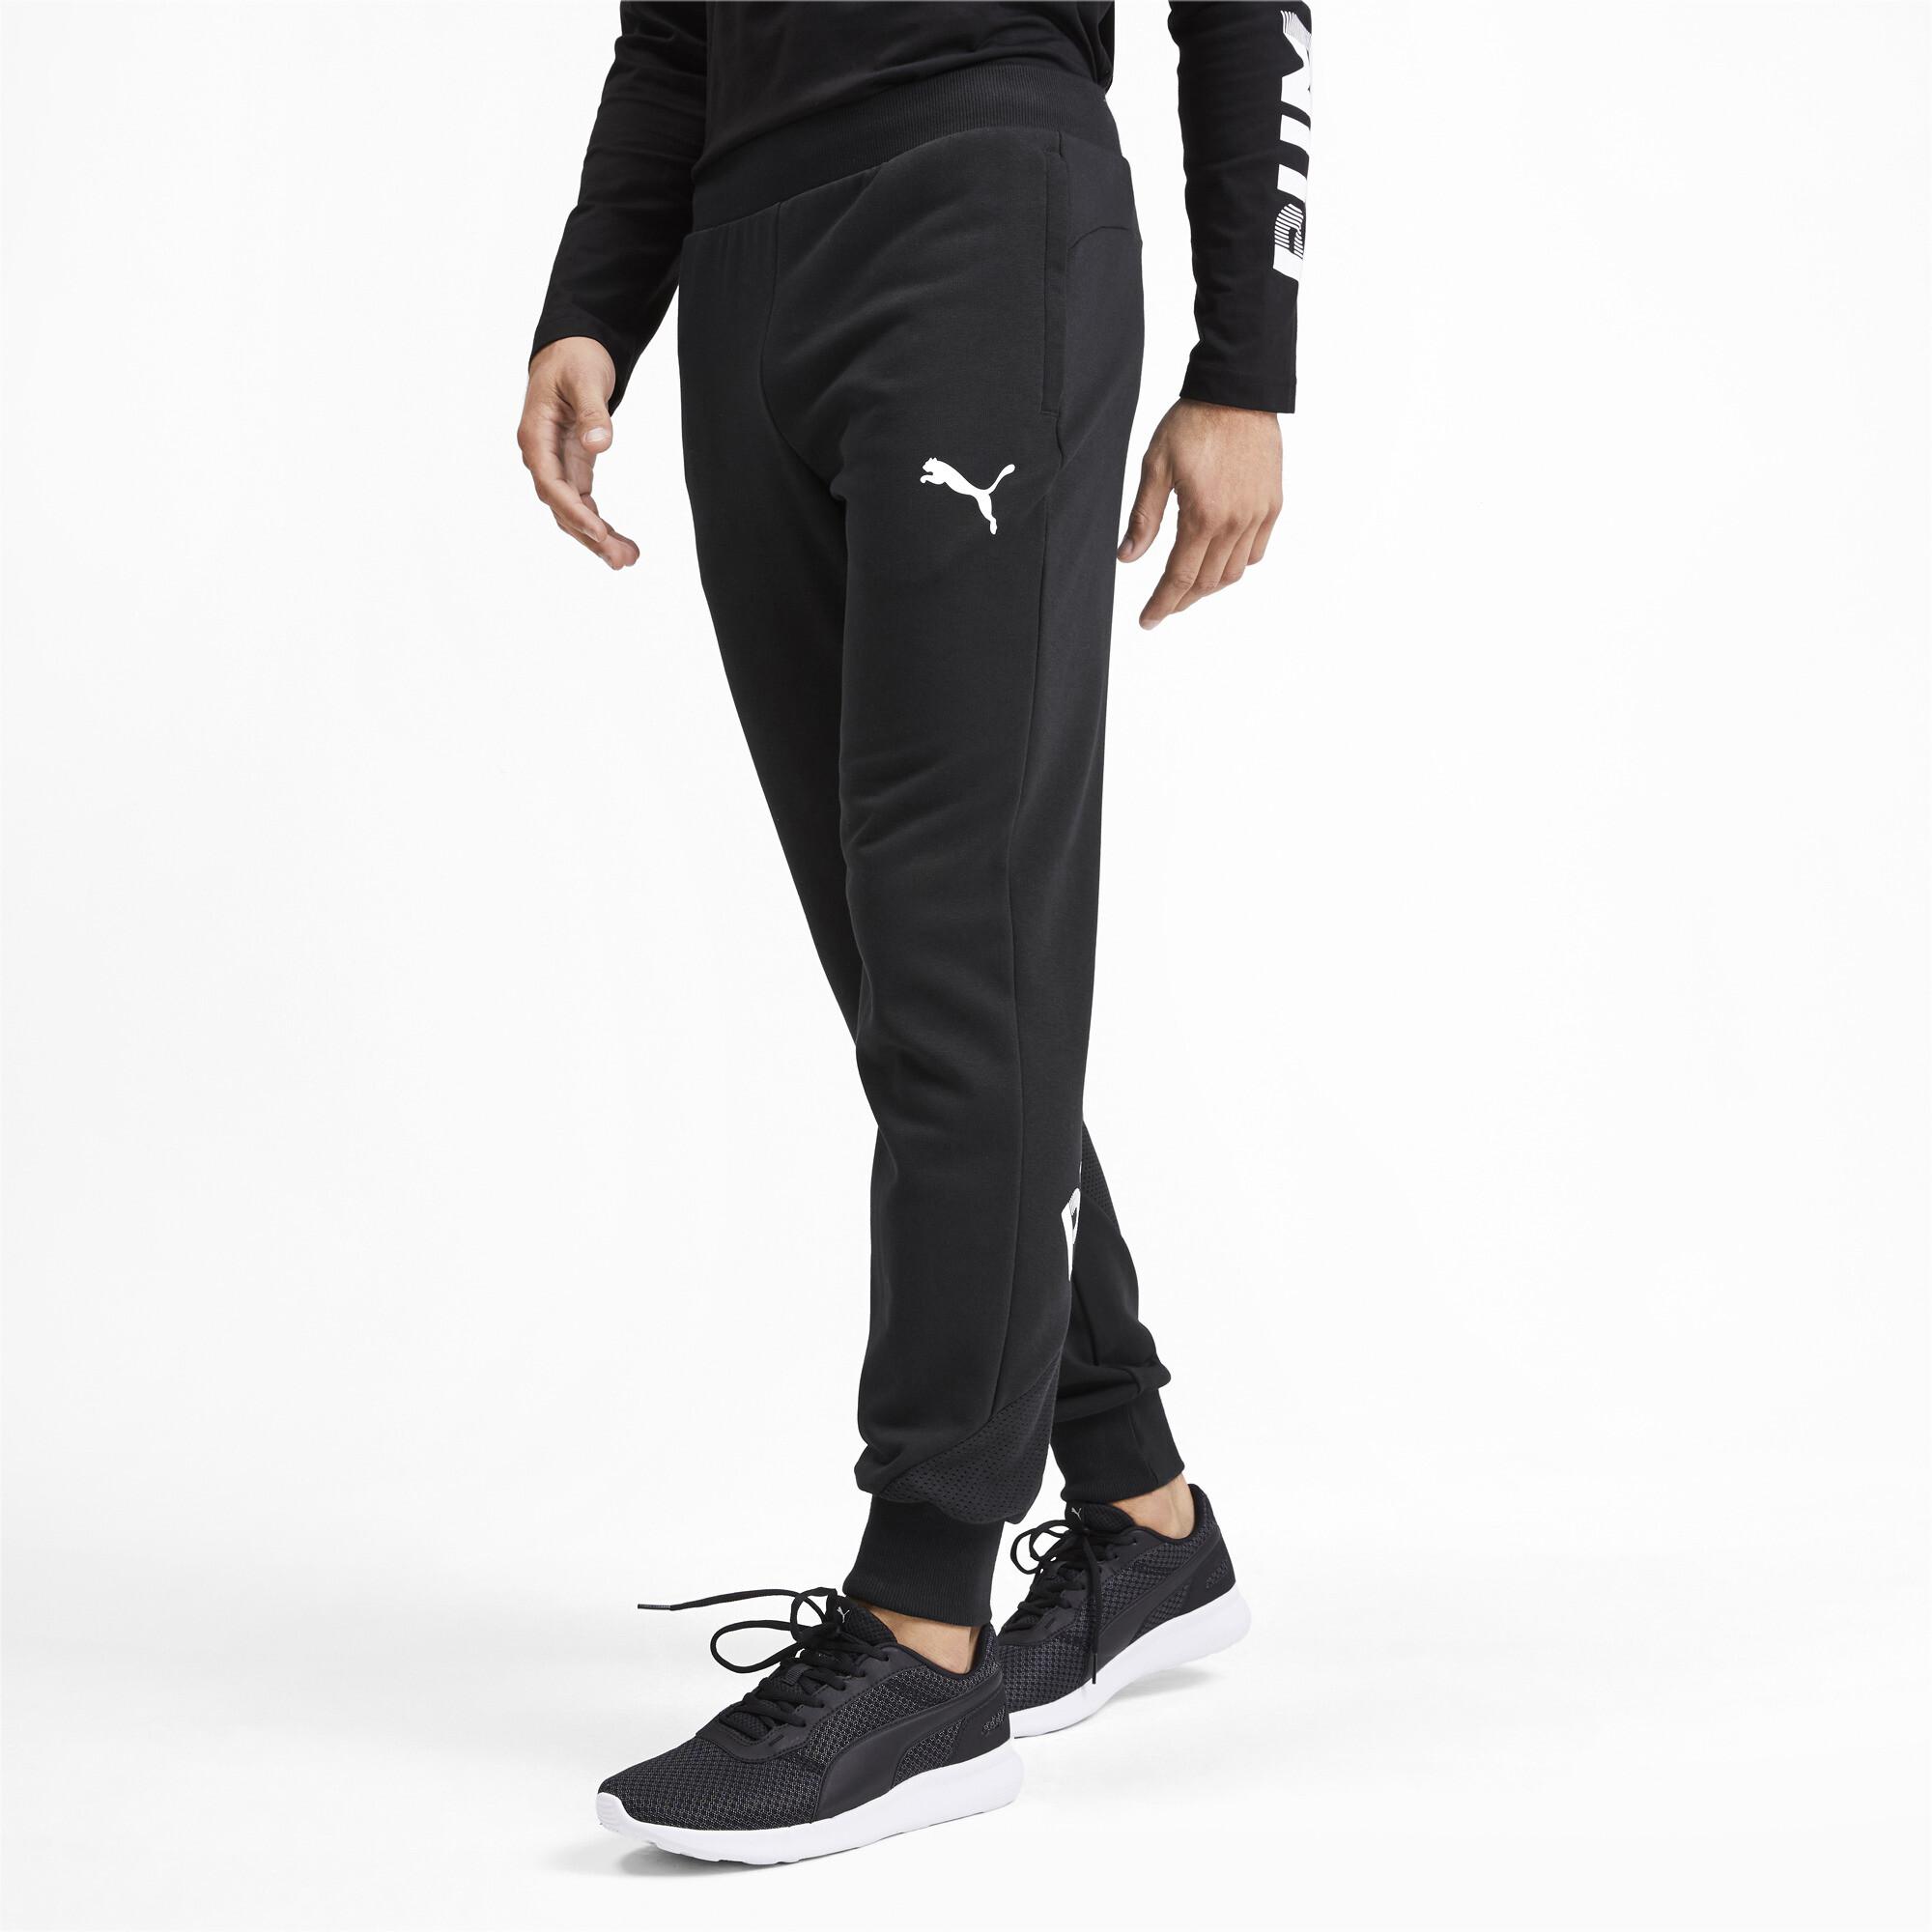 PUMA-Modern-Sports-Men-039-s-Sweatpants-Men-Knitted-Pants-Basics thumbnail 9